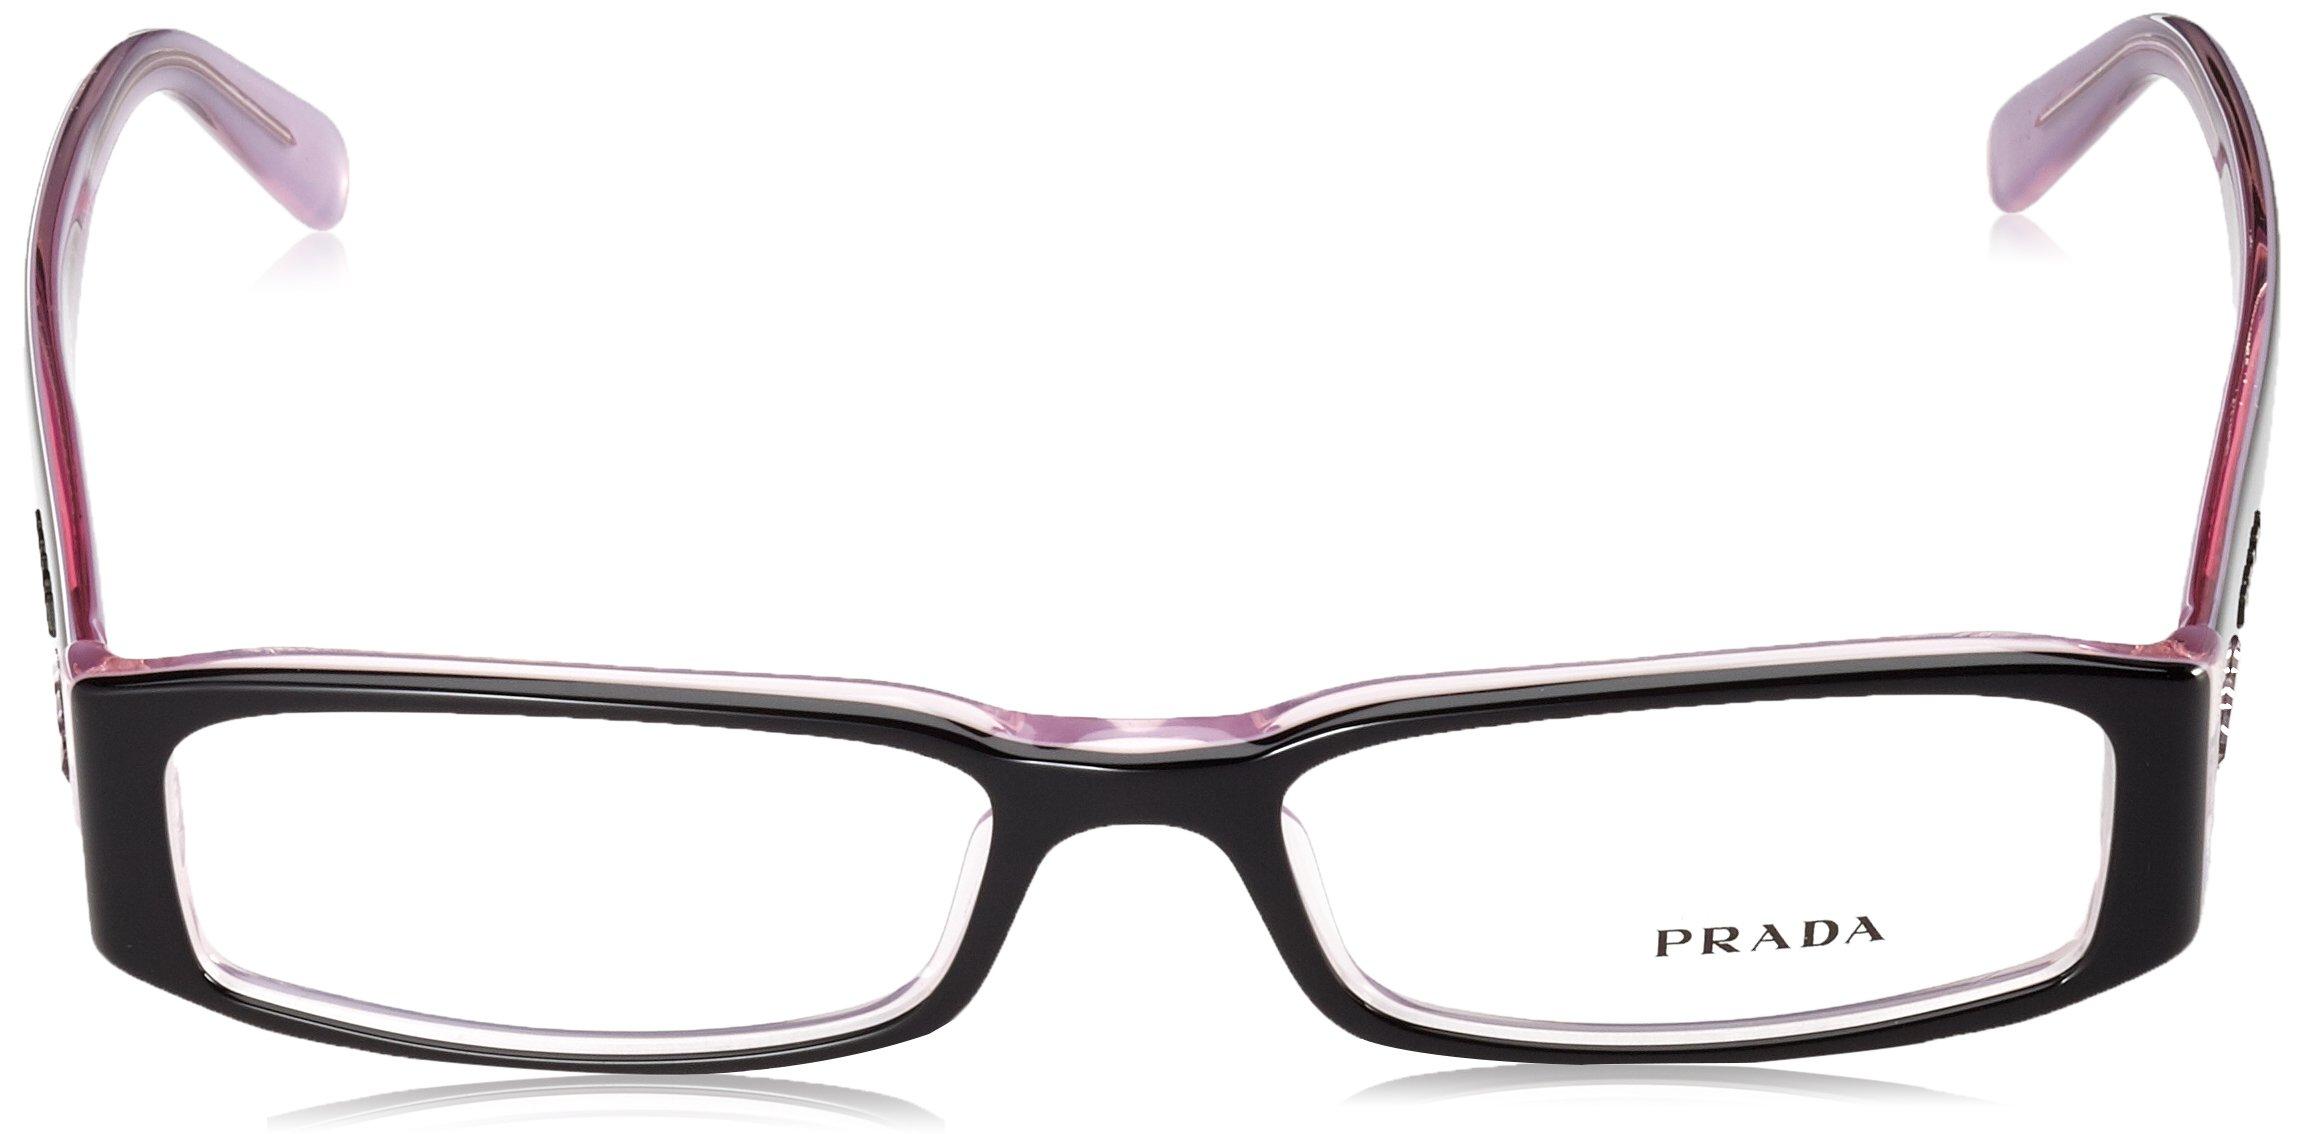 PRADA EYEGLASSES VPR 10F BLACK 3AX-101 VPR10FENTIC by Prada (Image #2)